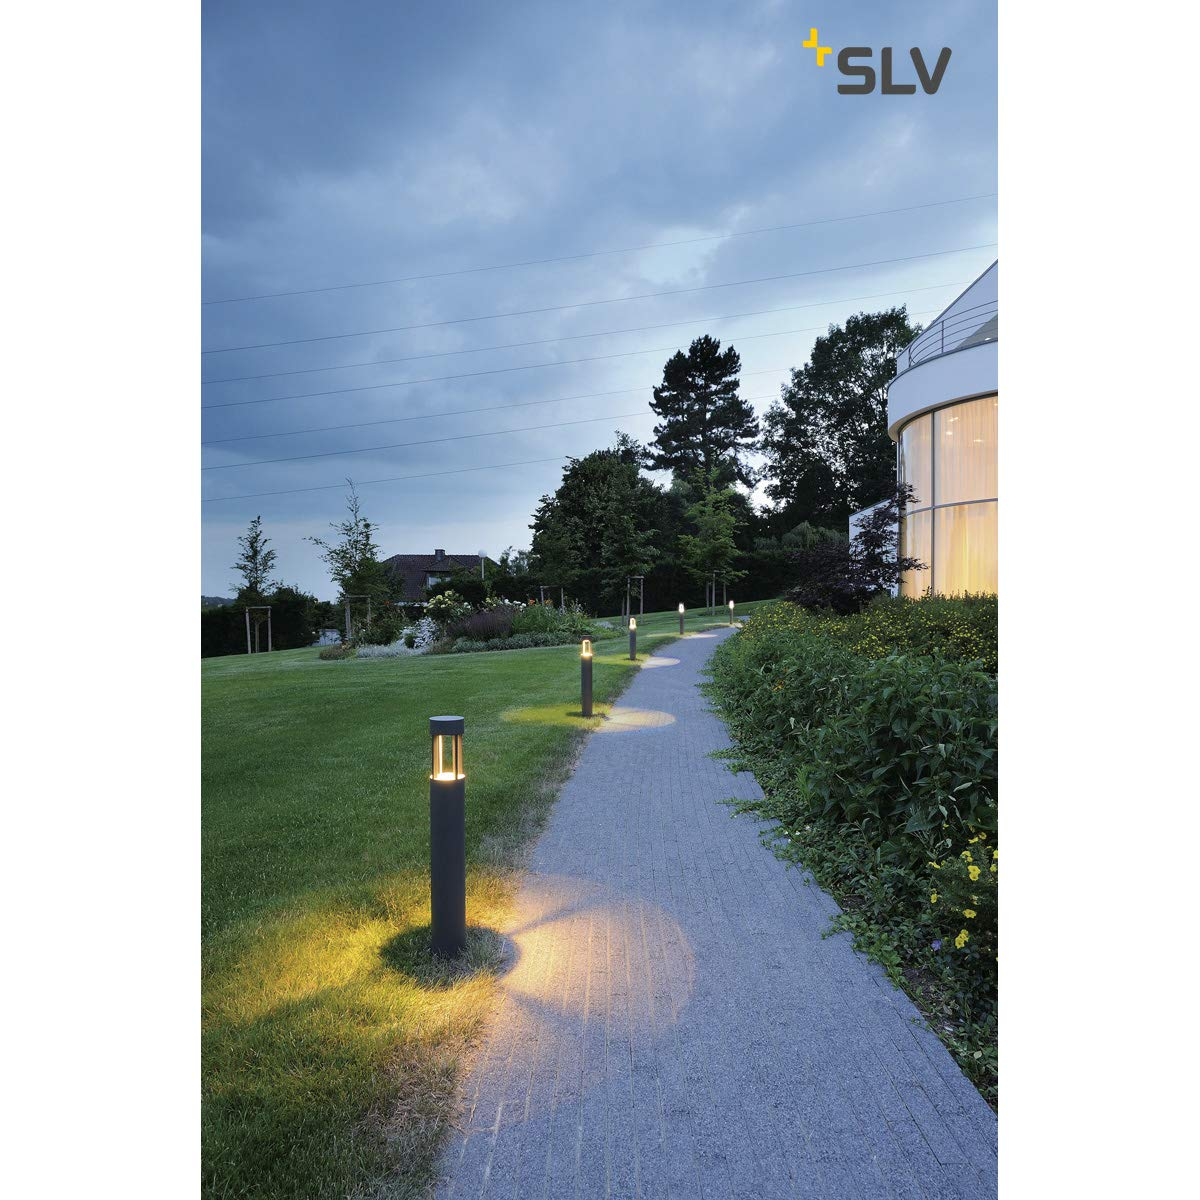 gris anthracite blanc chaud SLV 231455/emplacements 300 7/W LED en aluminium gris anthracite, lampe standard